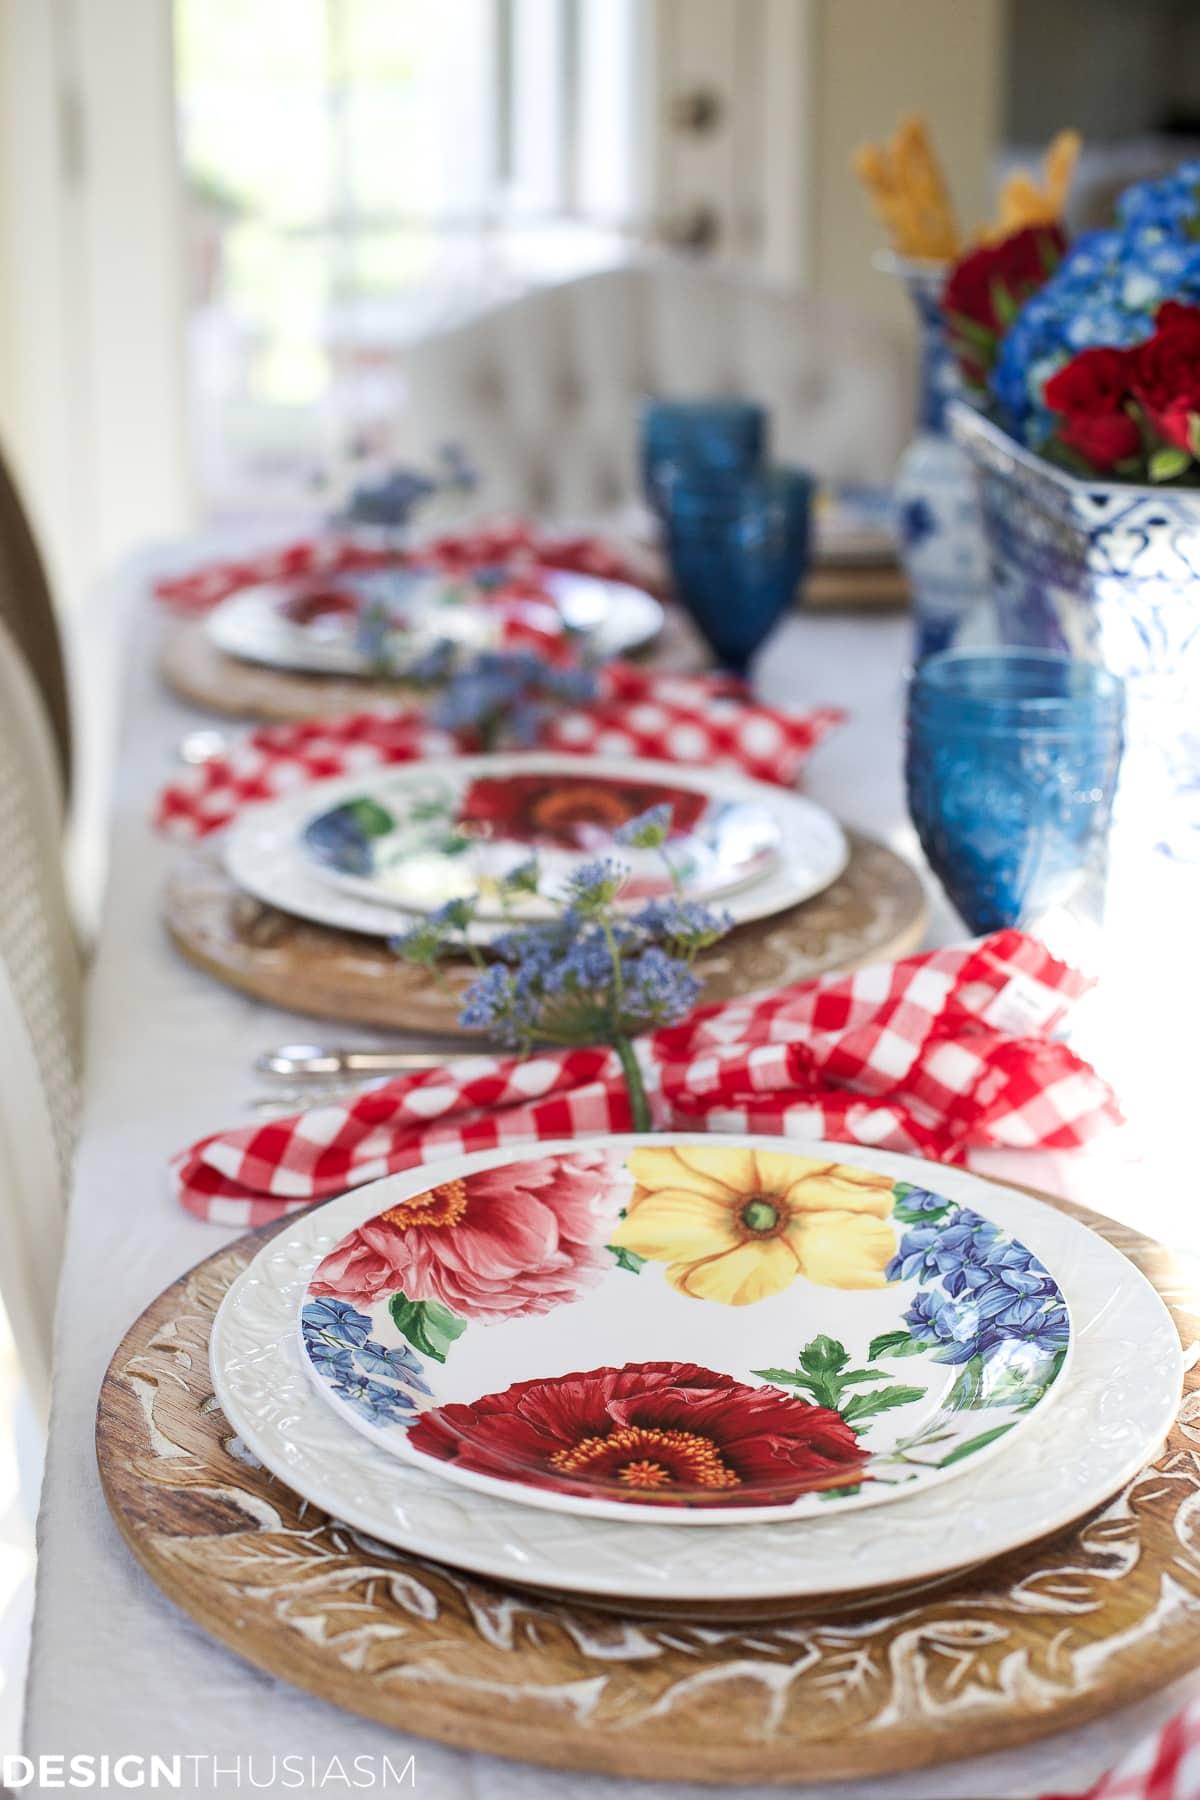 Garden party decorations   Tabletop tips for summer entertaining - designthusiasm.com